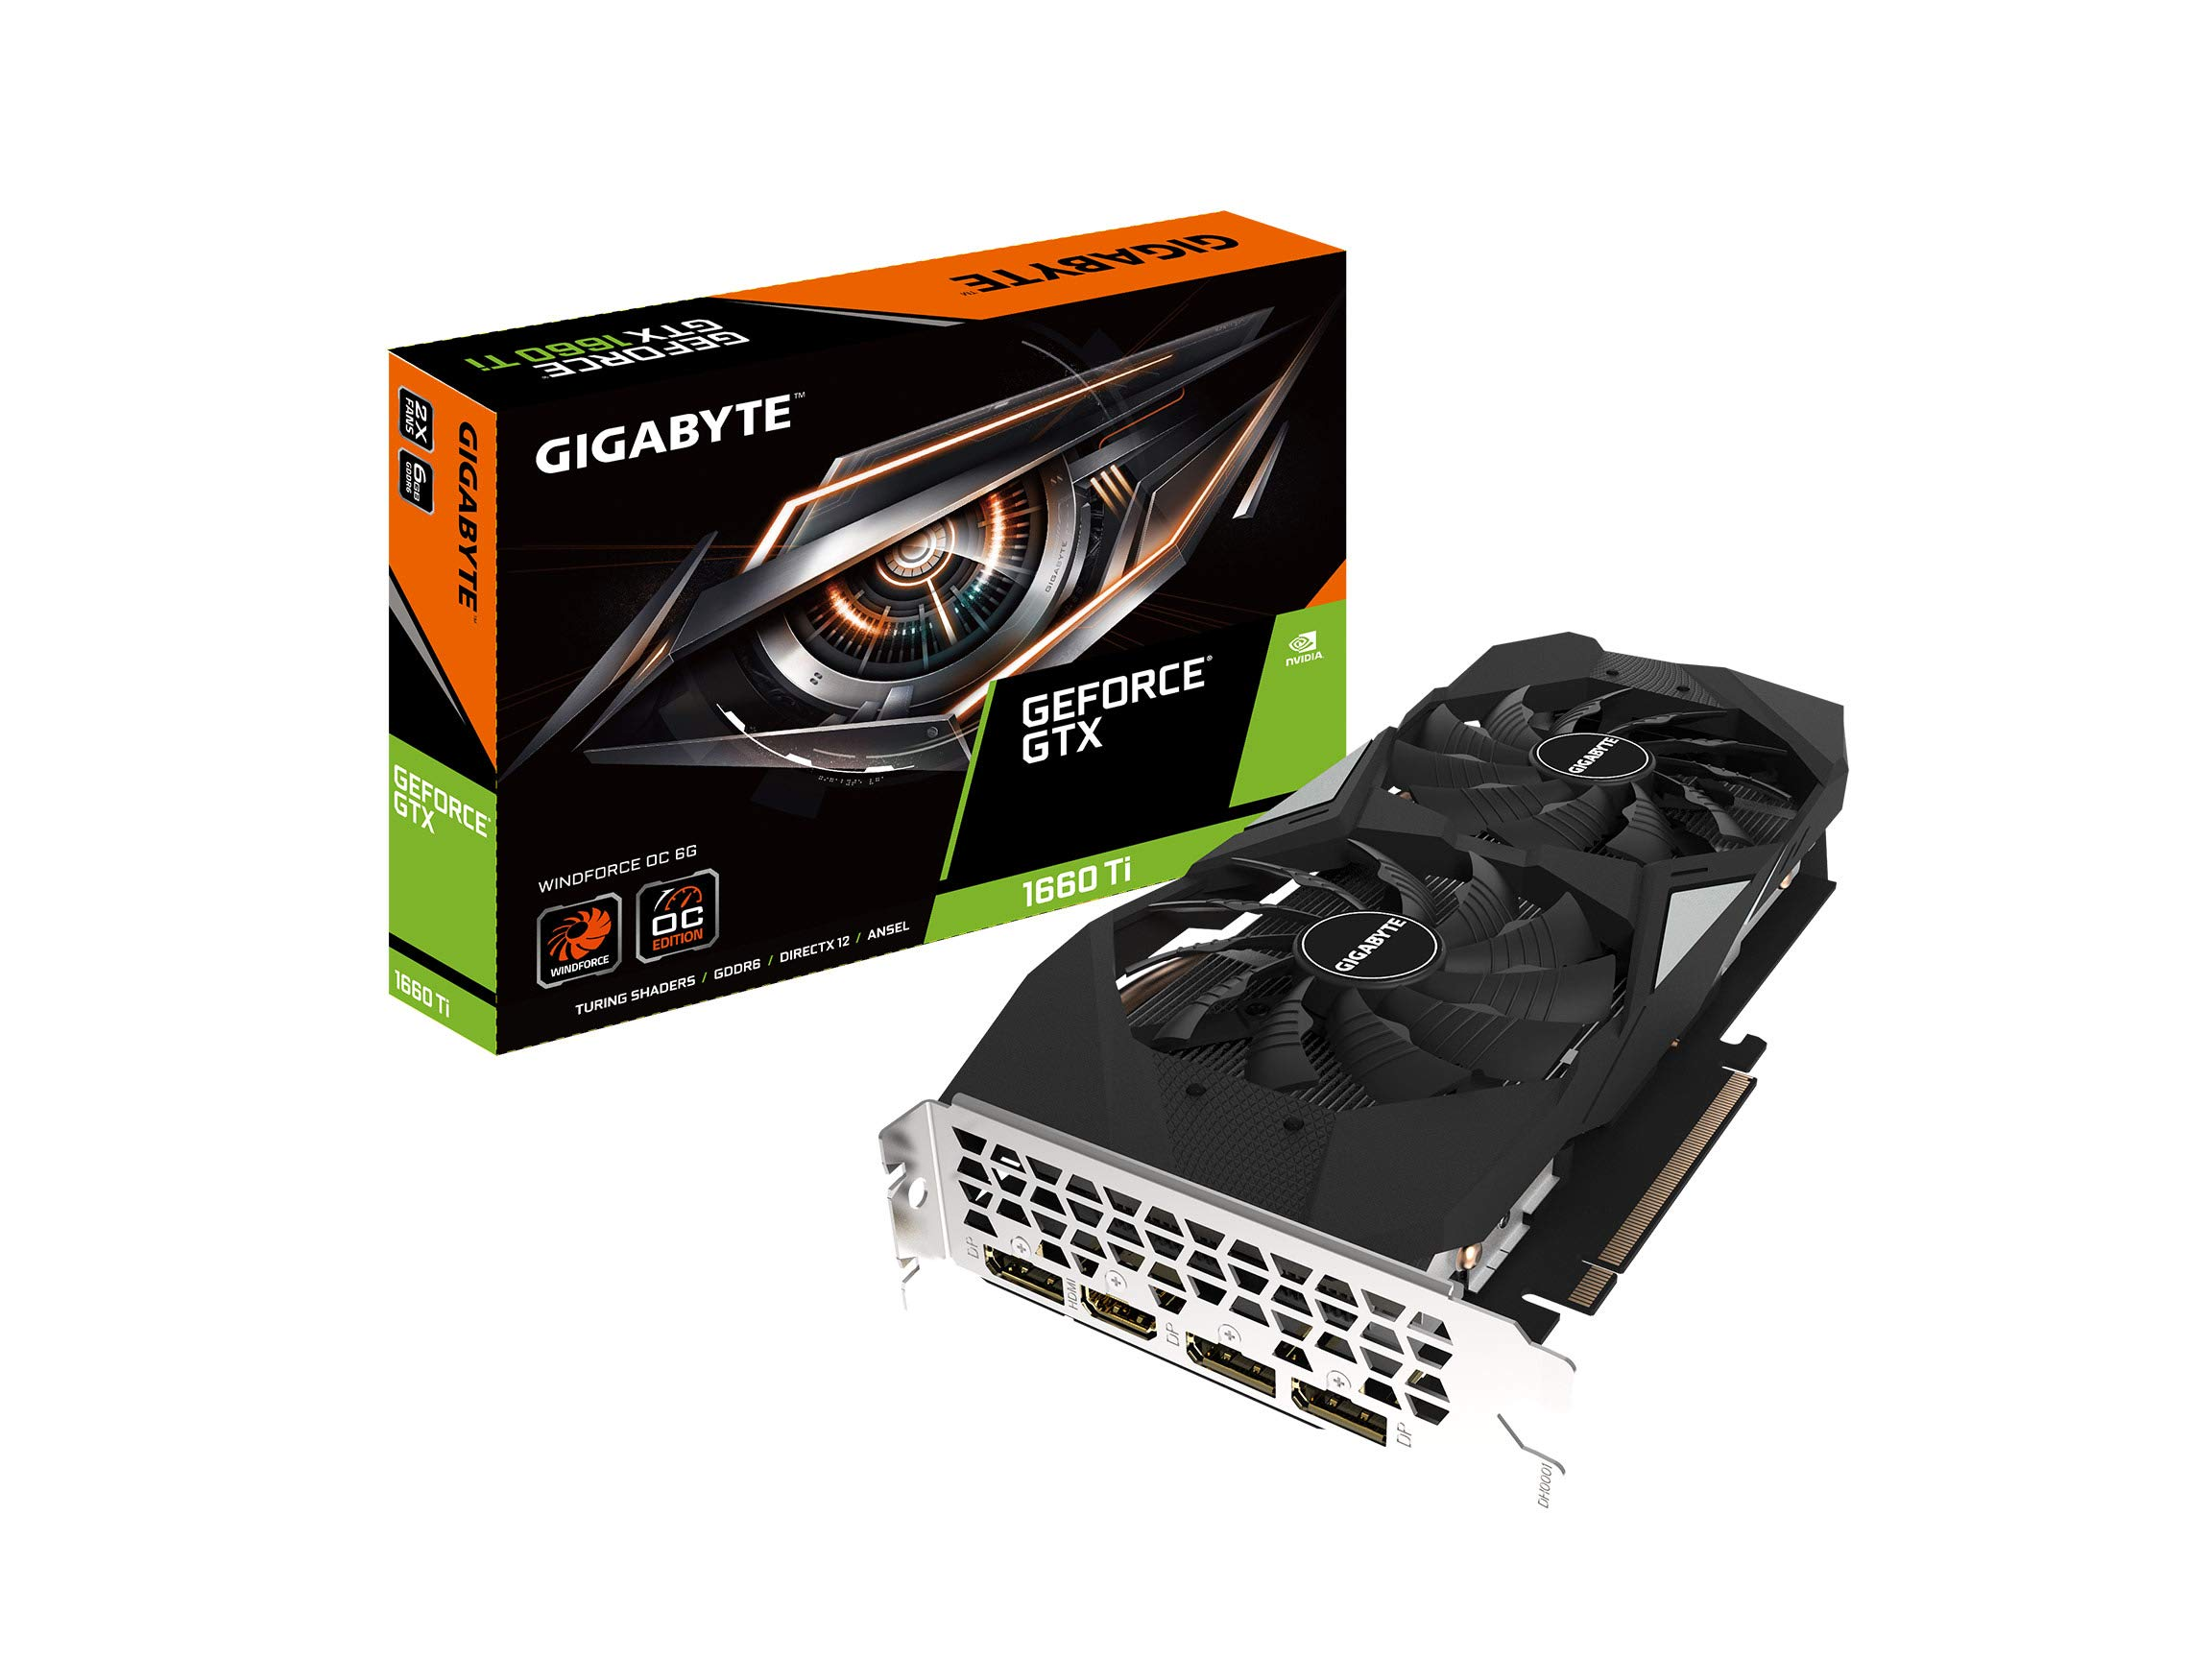 GIGABYTE GeForce GTX 1660 Ti Windforce OC 6G 192-bit GDDR6 DisplayPort 1.4 HDMI 2.0B with Windforce 2X Cooling System Graphic Cards- Gv-N166TWF2OC-6GD by Gigabyte